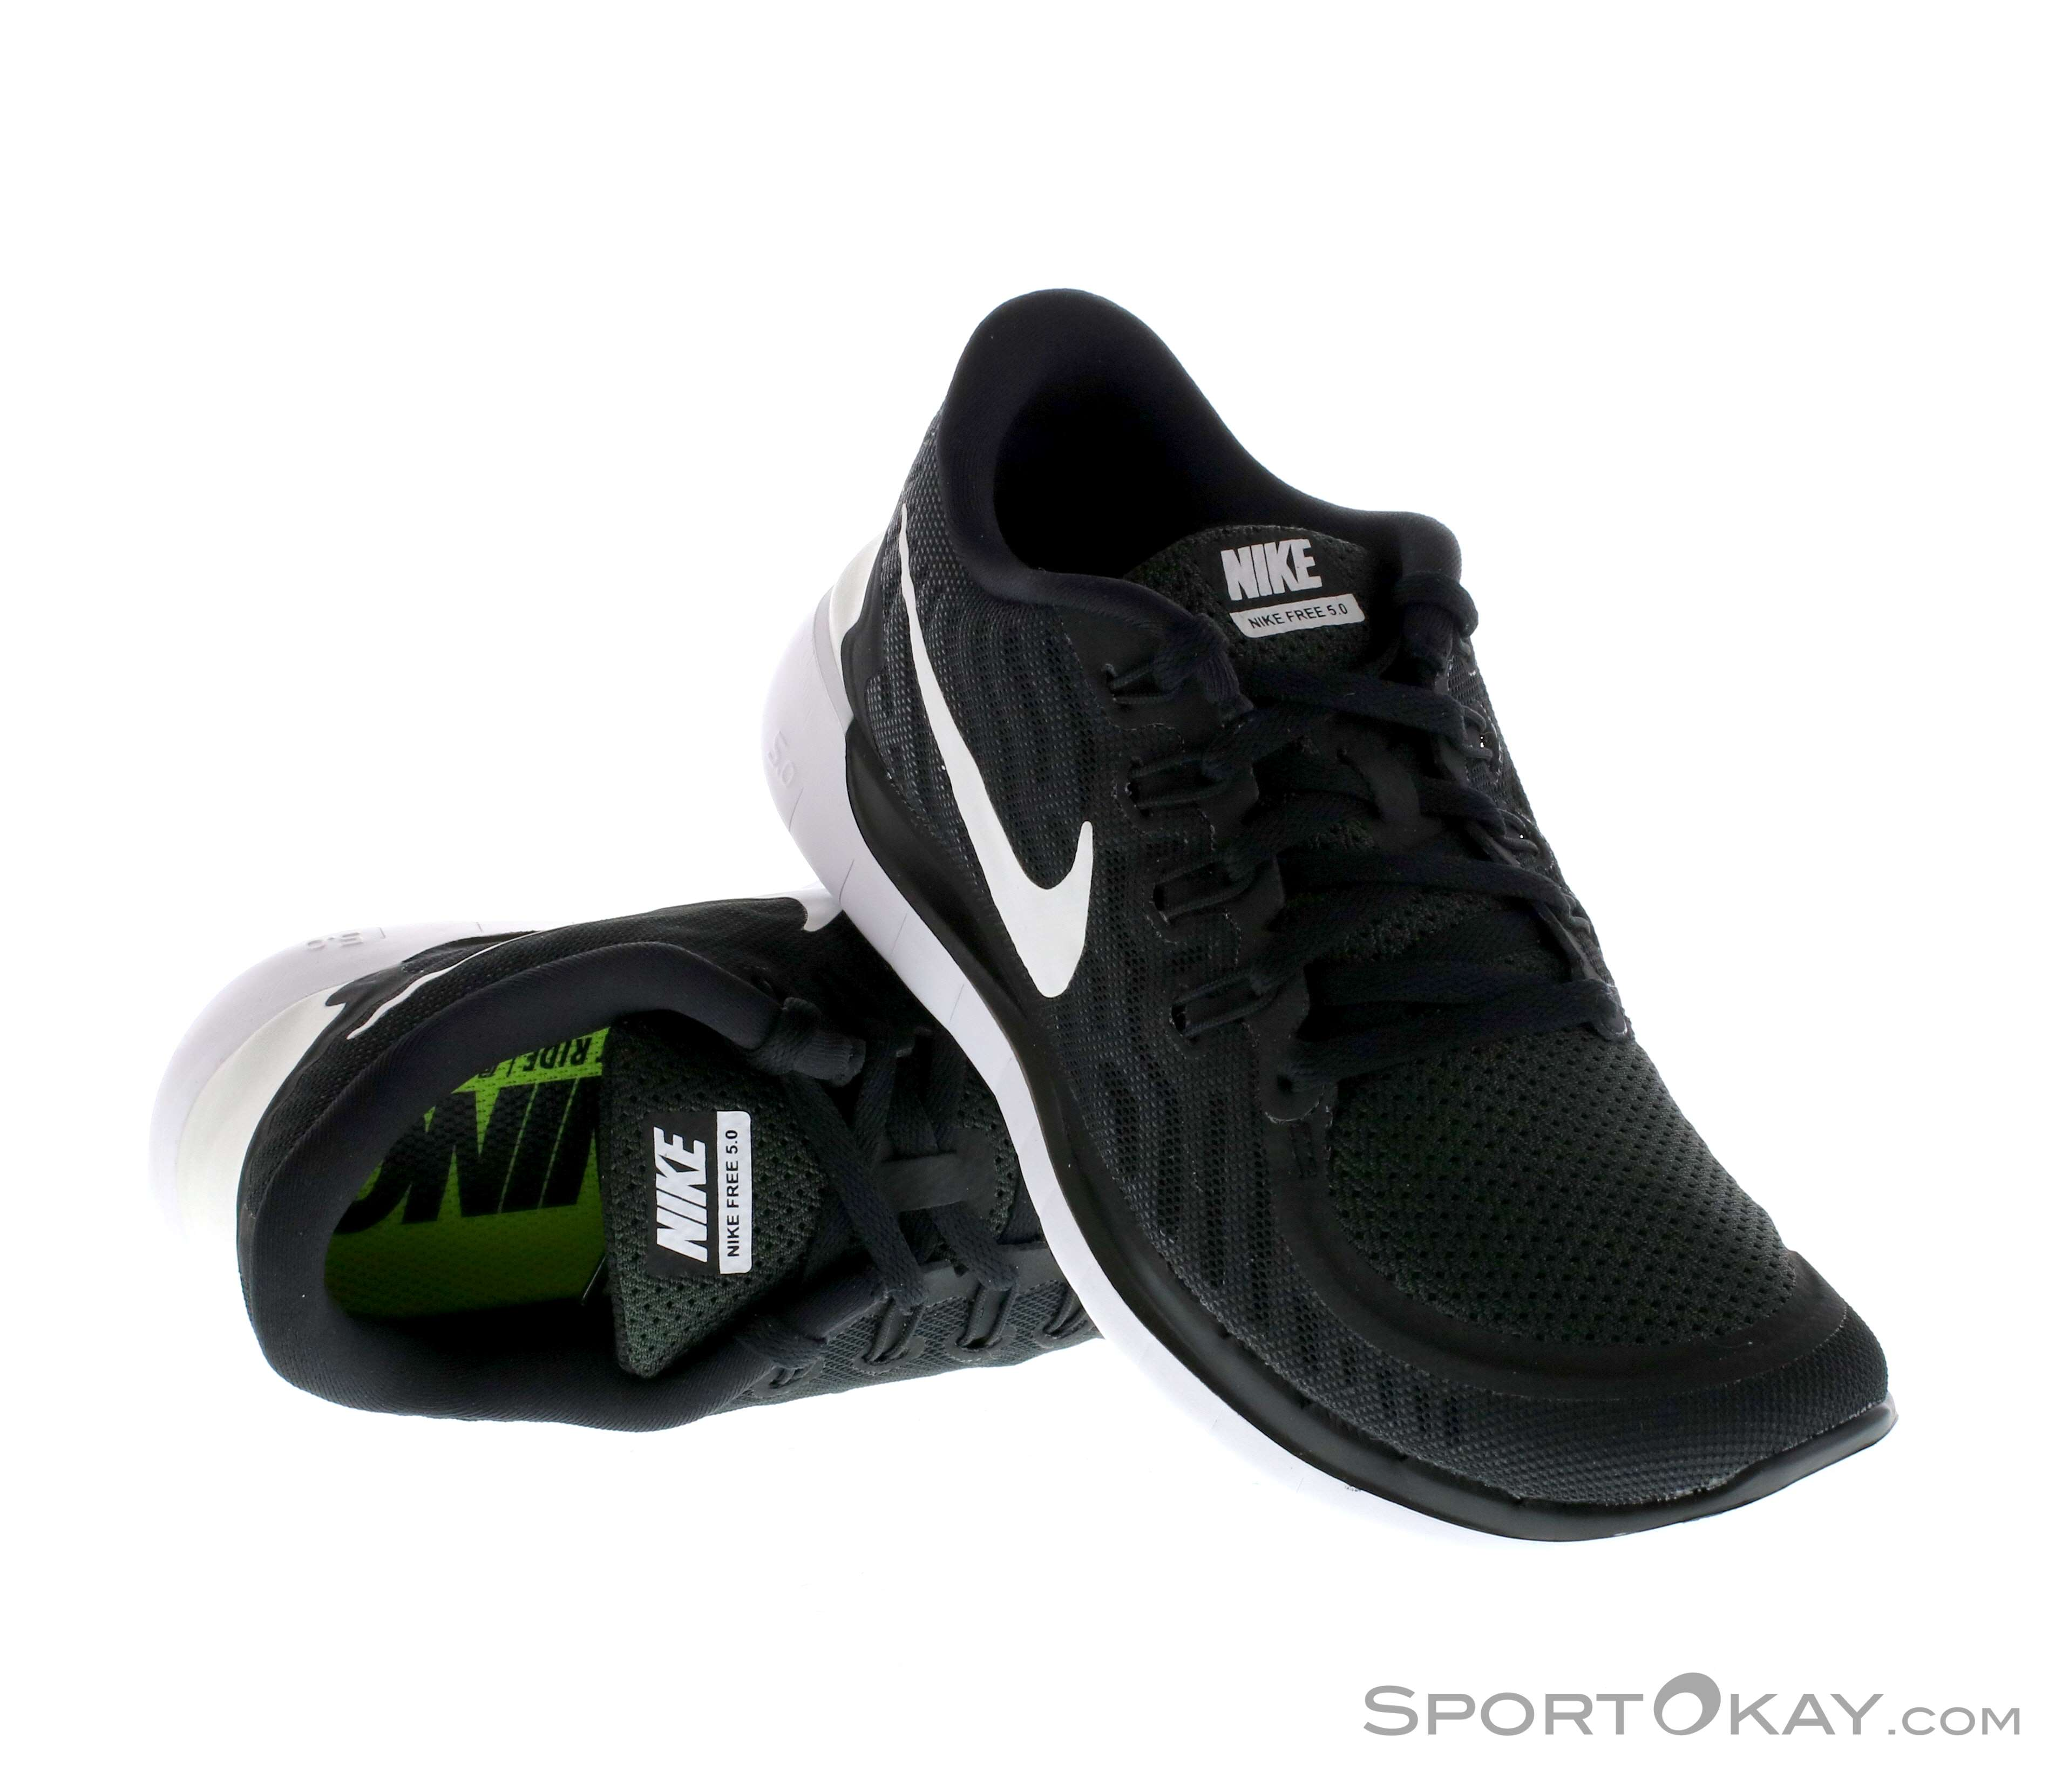 Nike Nike Free 5.0 Womens Running Shoes